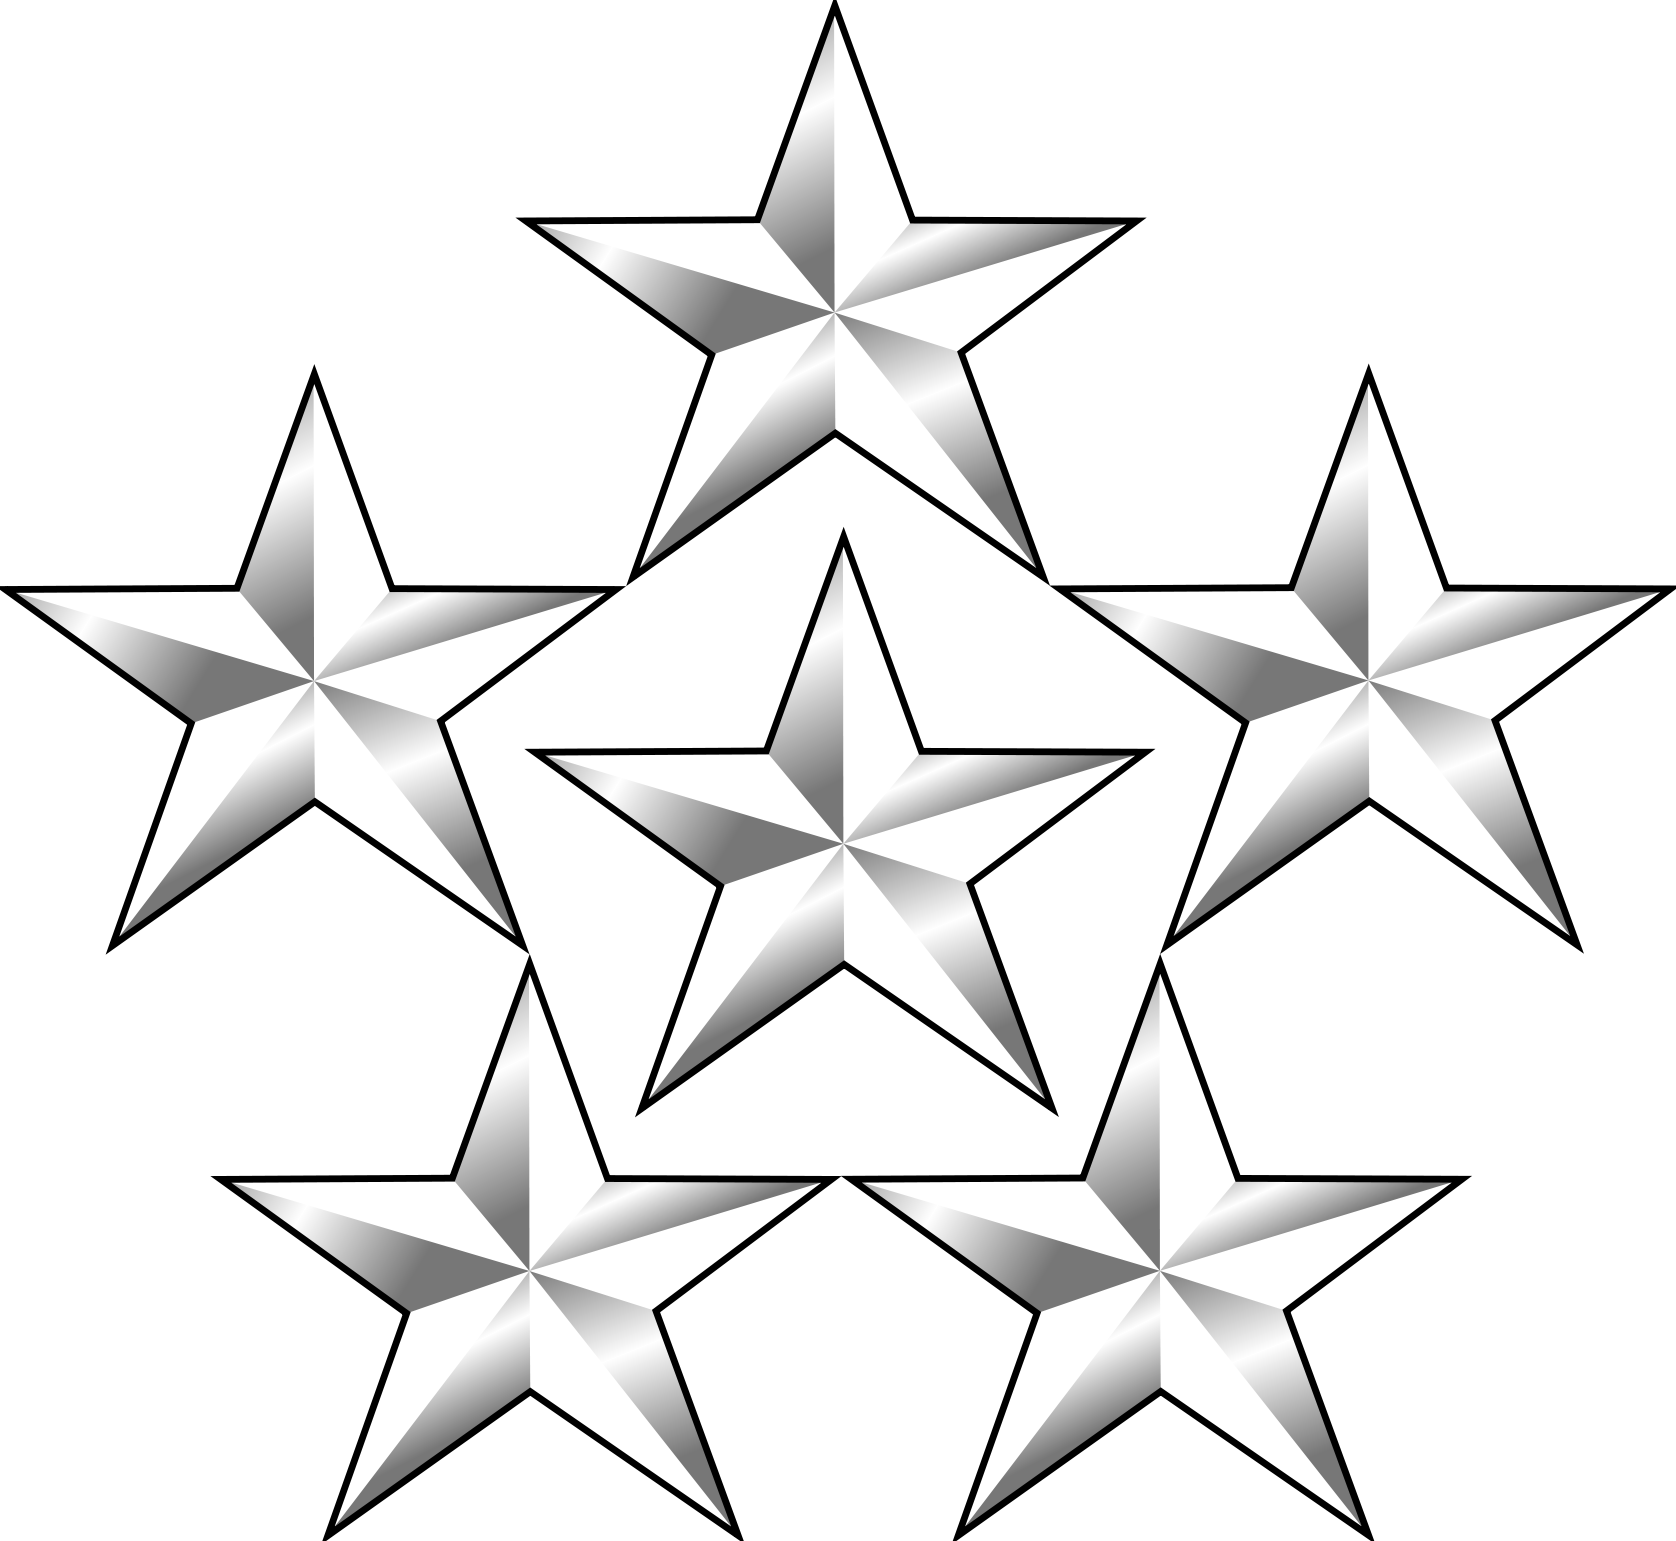 Drawn stars transparent pixel Star Star png File:6 File:6